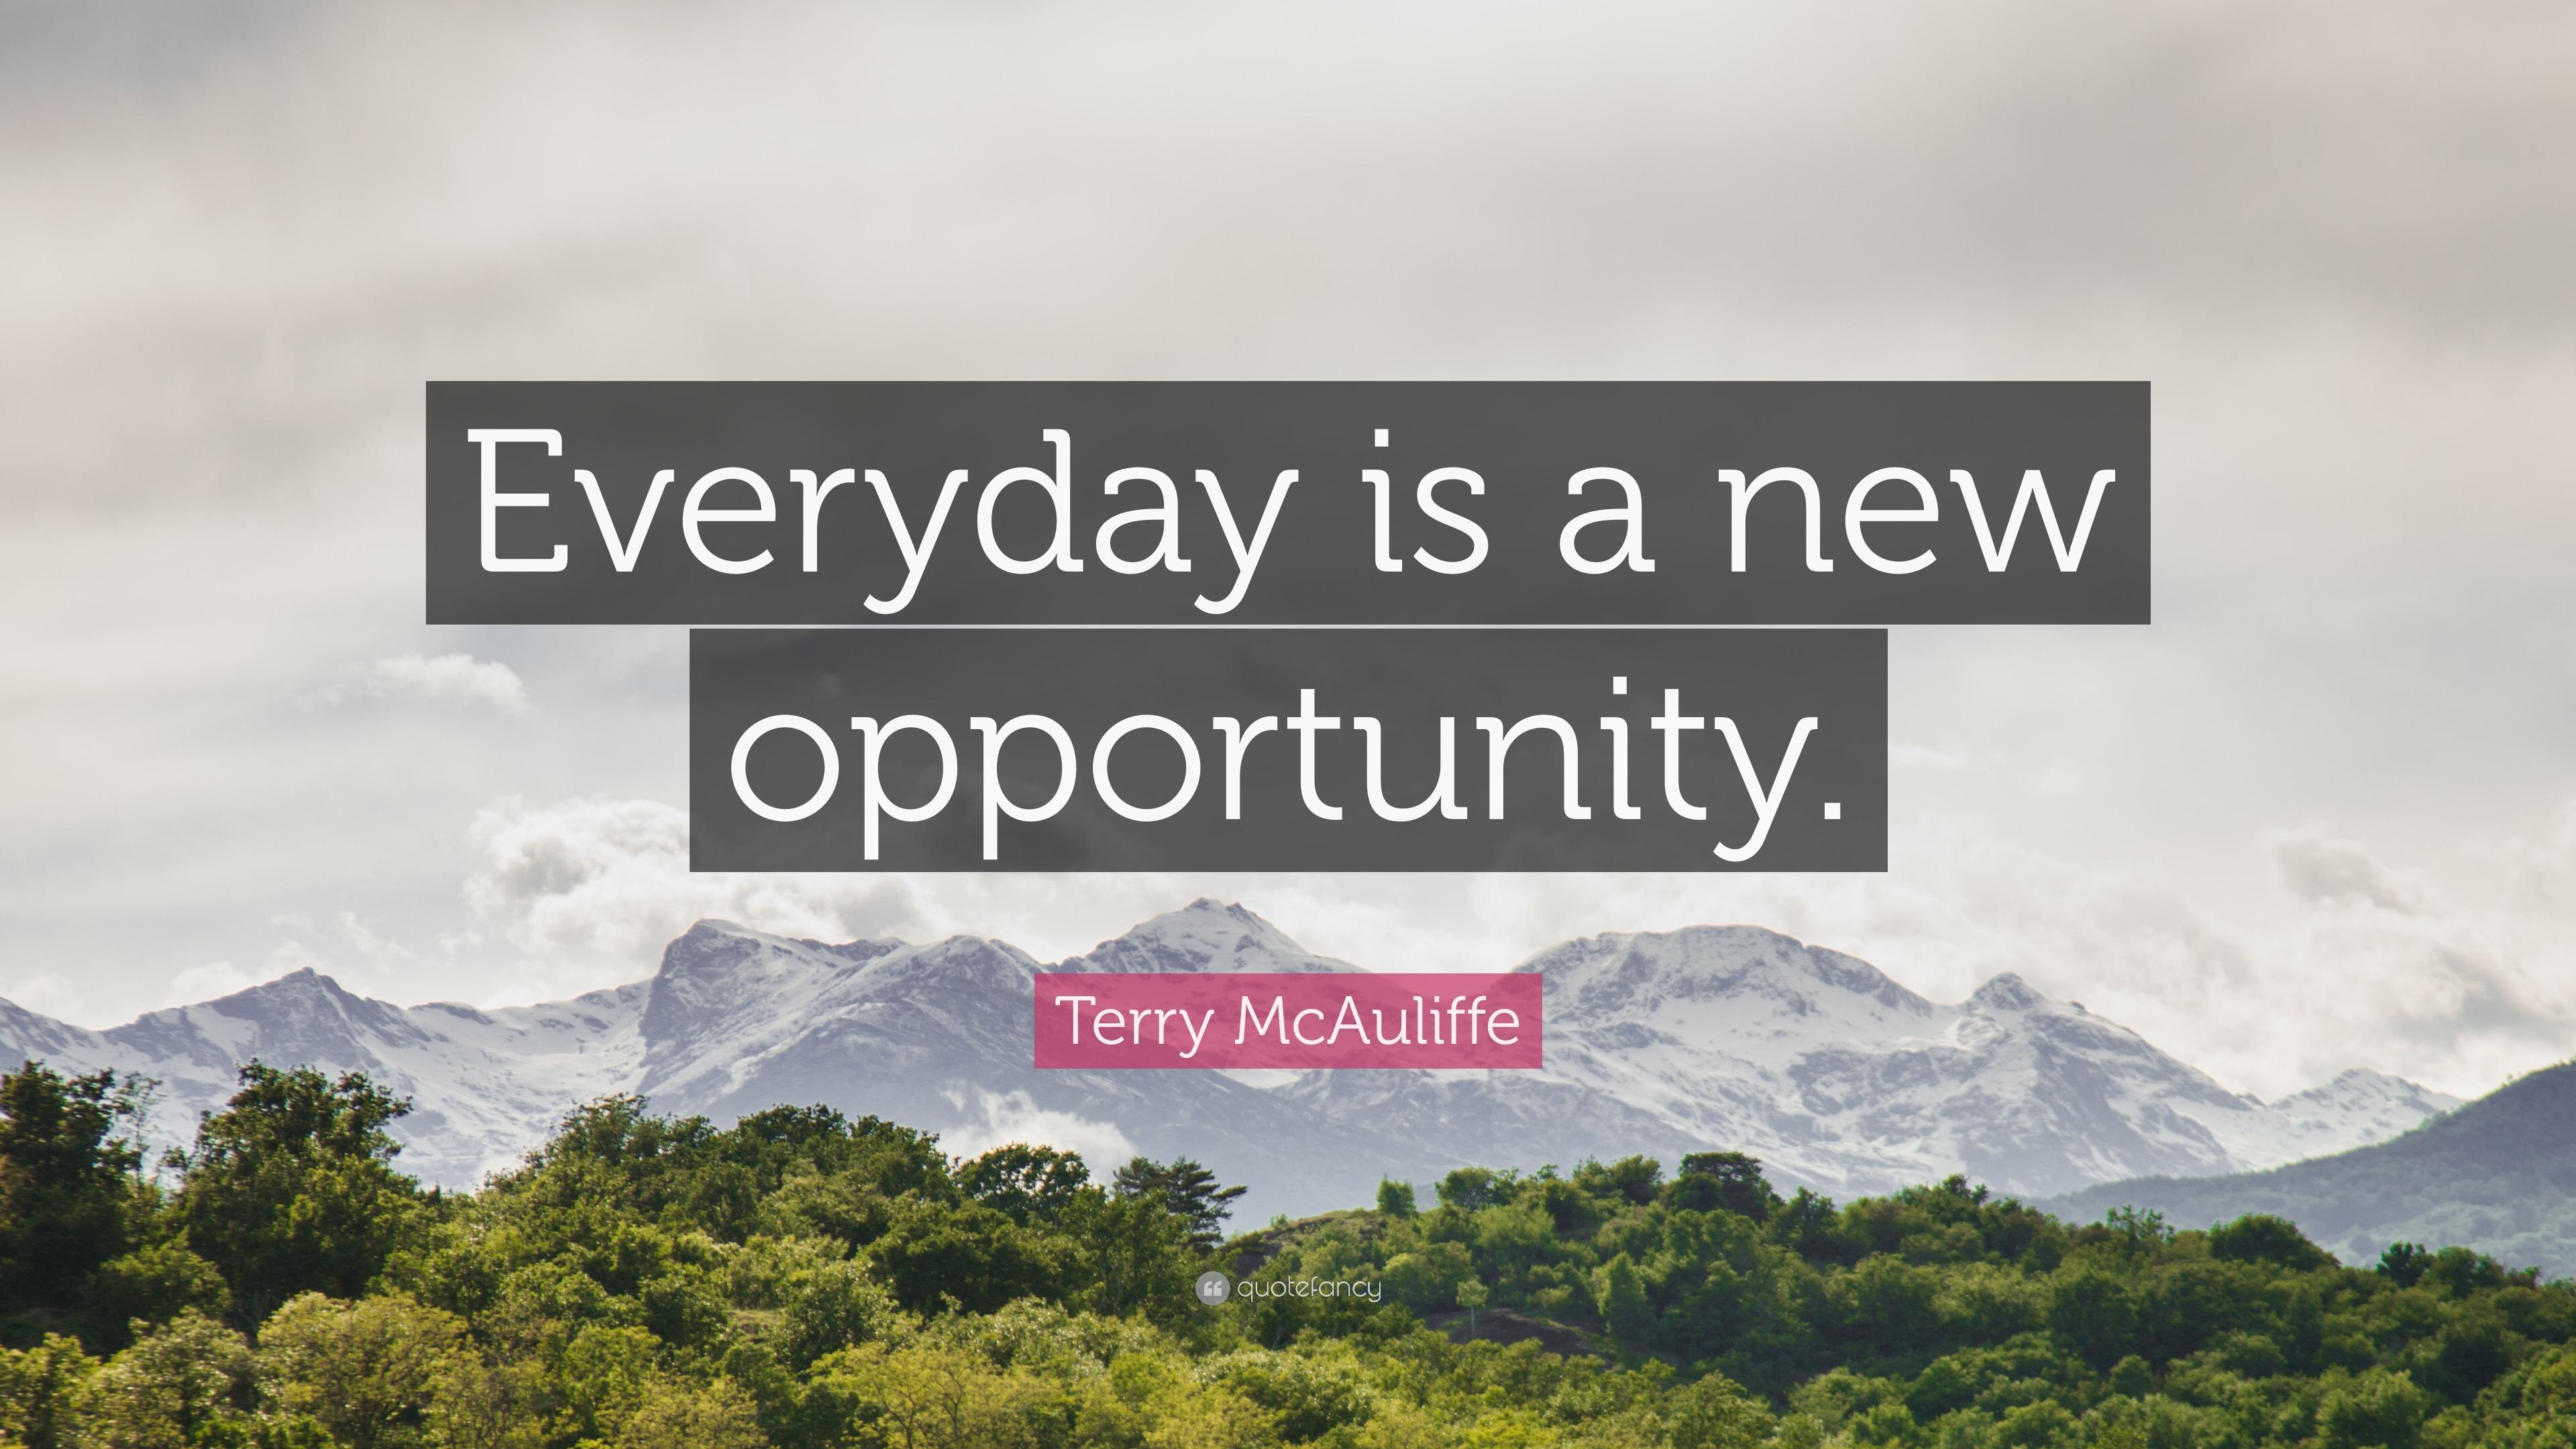 Top 15 Terry McAuliffe Quotes (2021 Update) - Quotefancy